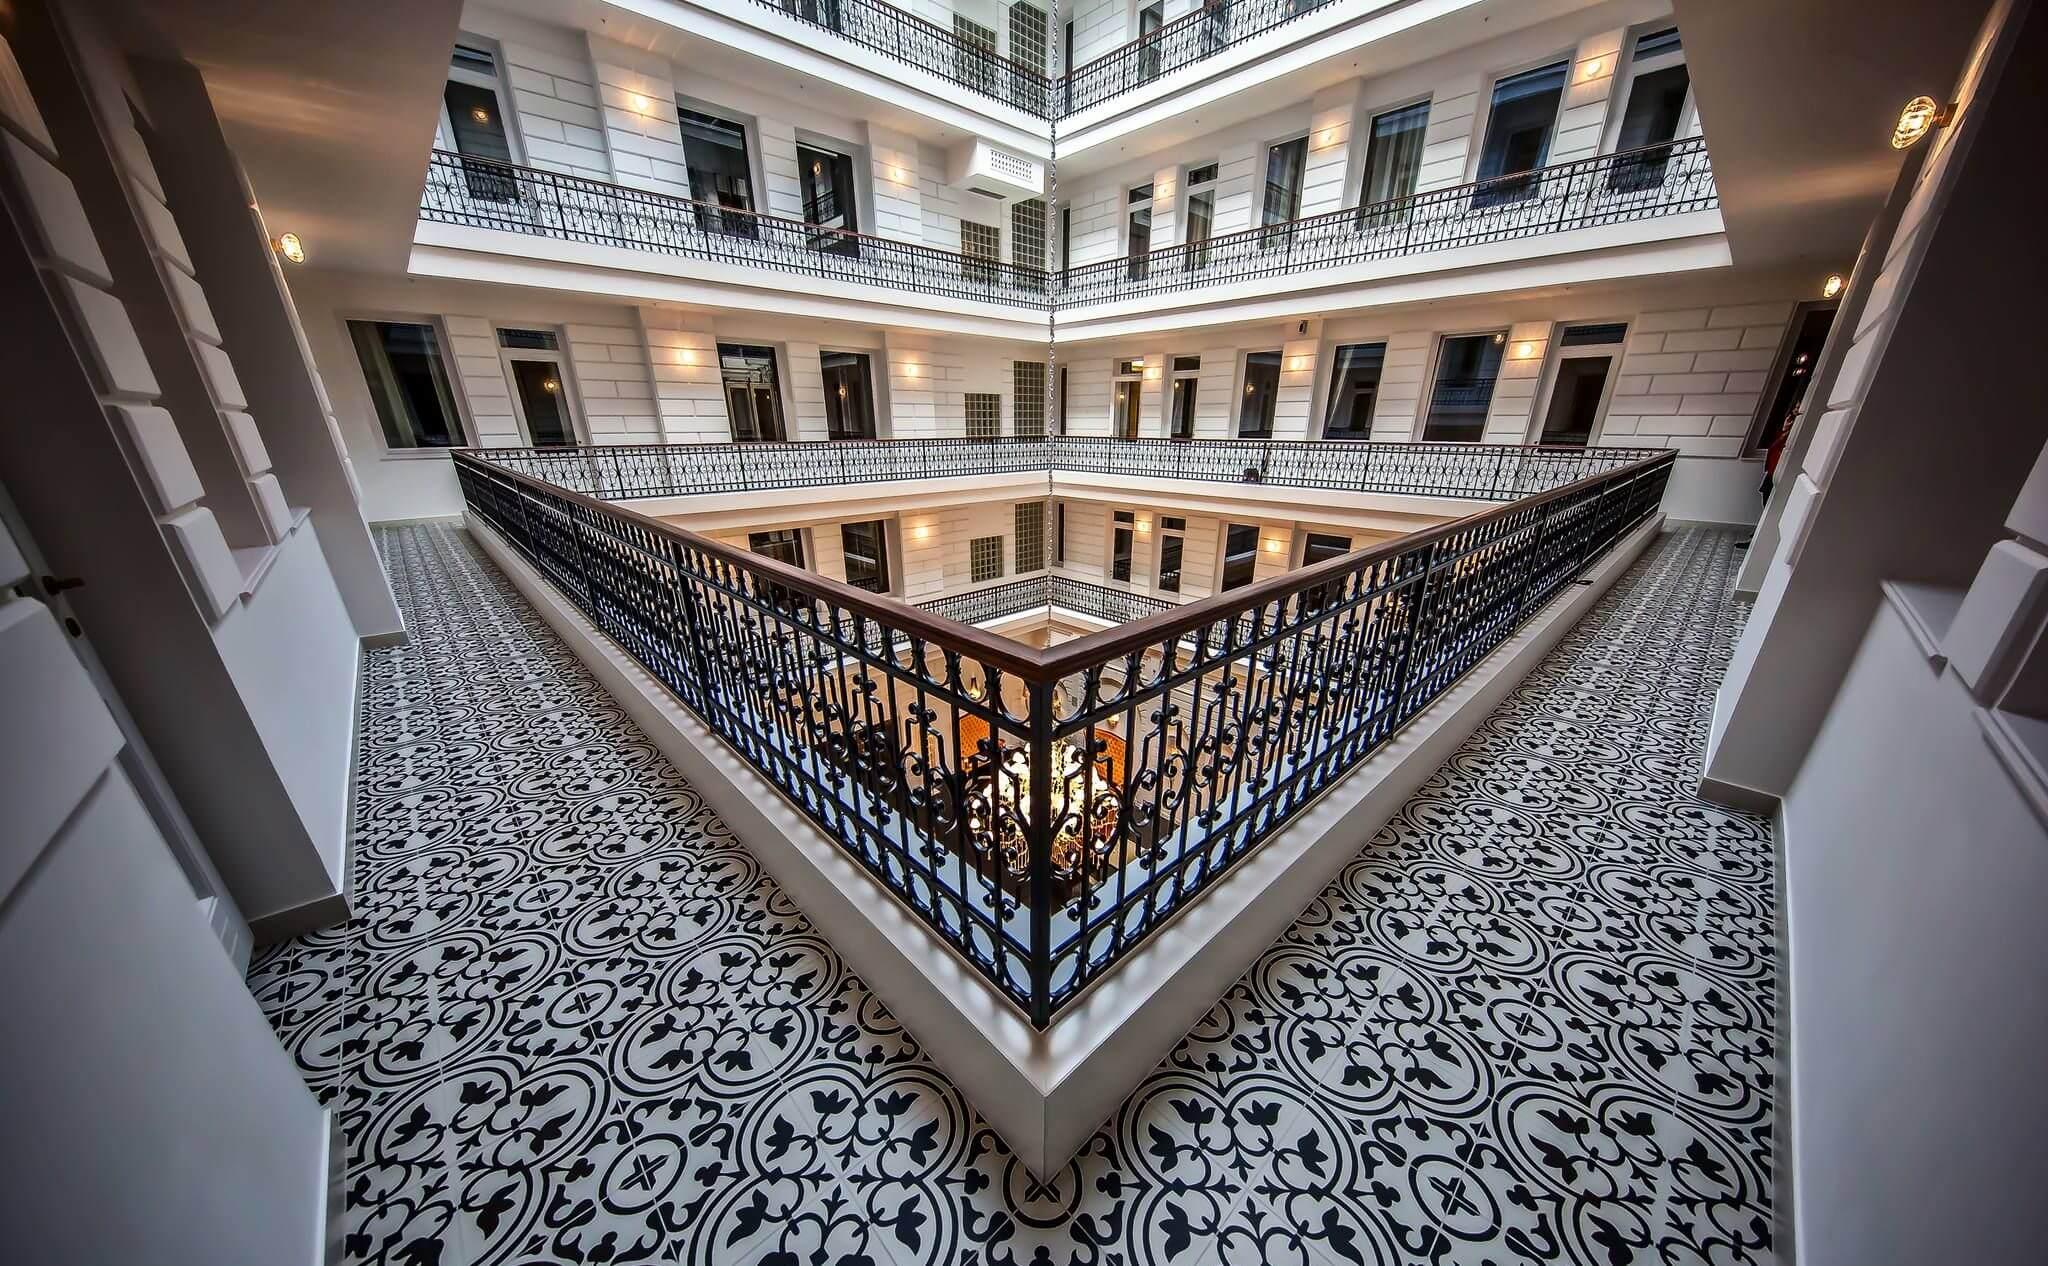 Prestige Hotel Budapest מלונות בבודפשט הונגריה מלון פרסטיז' 4 כוכבים